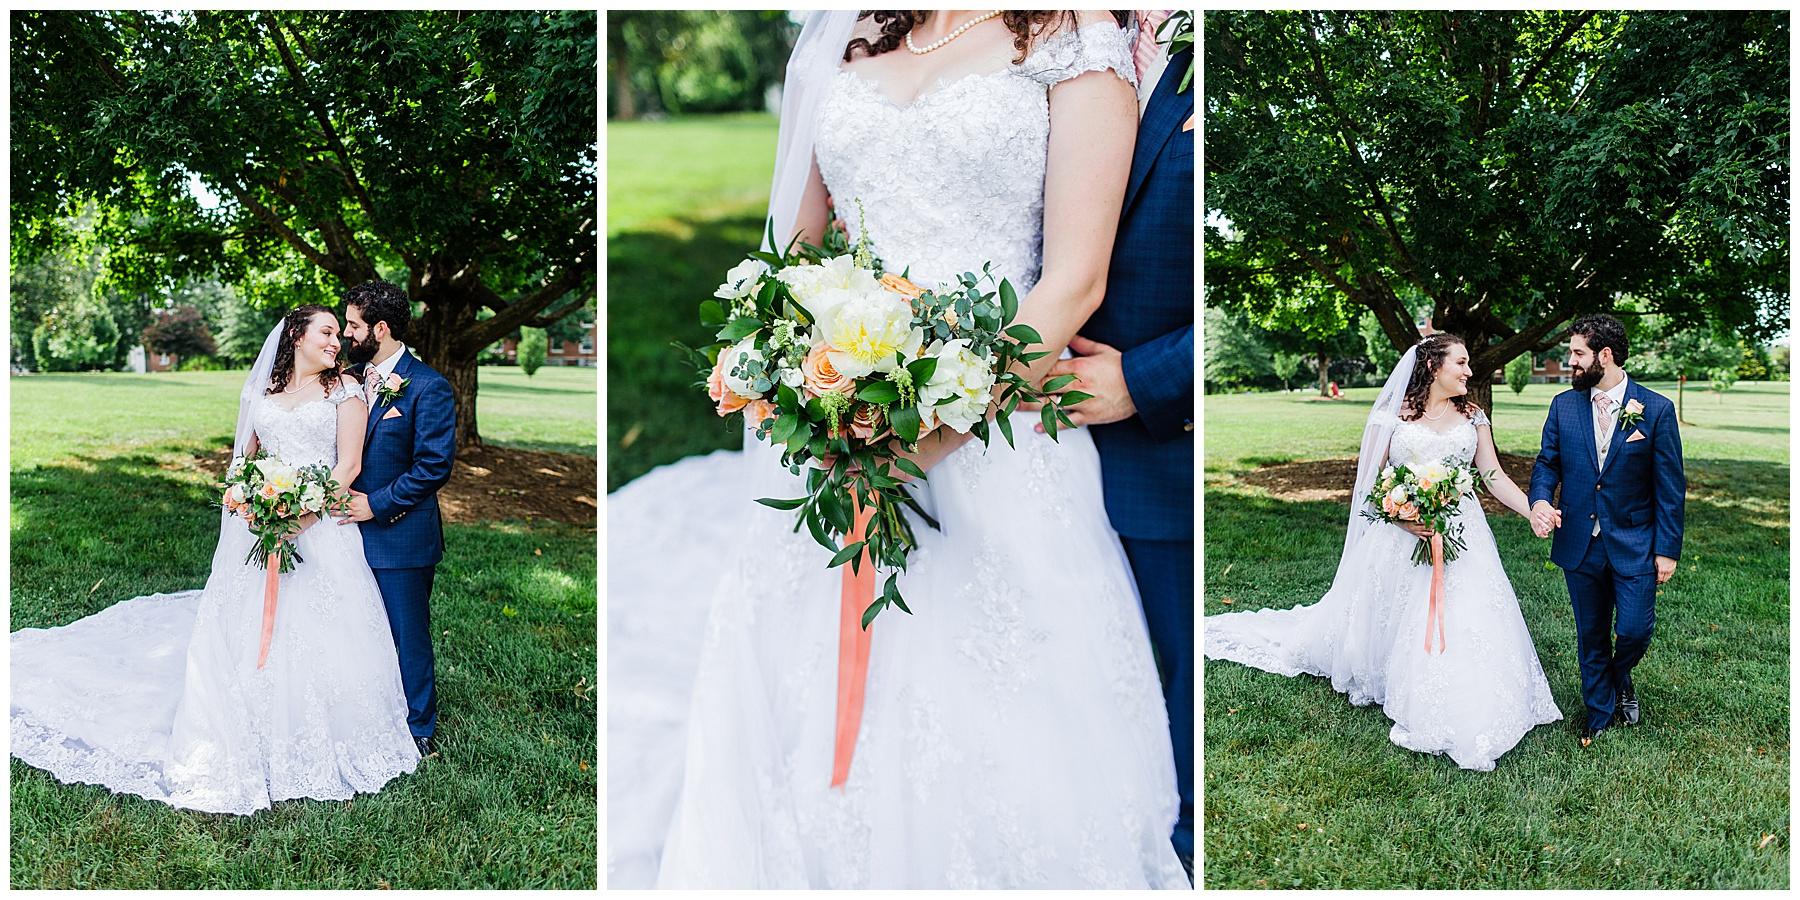 oak-ridge-estate-wedding-virginia-photographer35.jpg